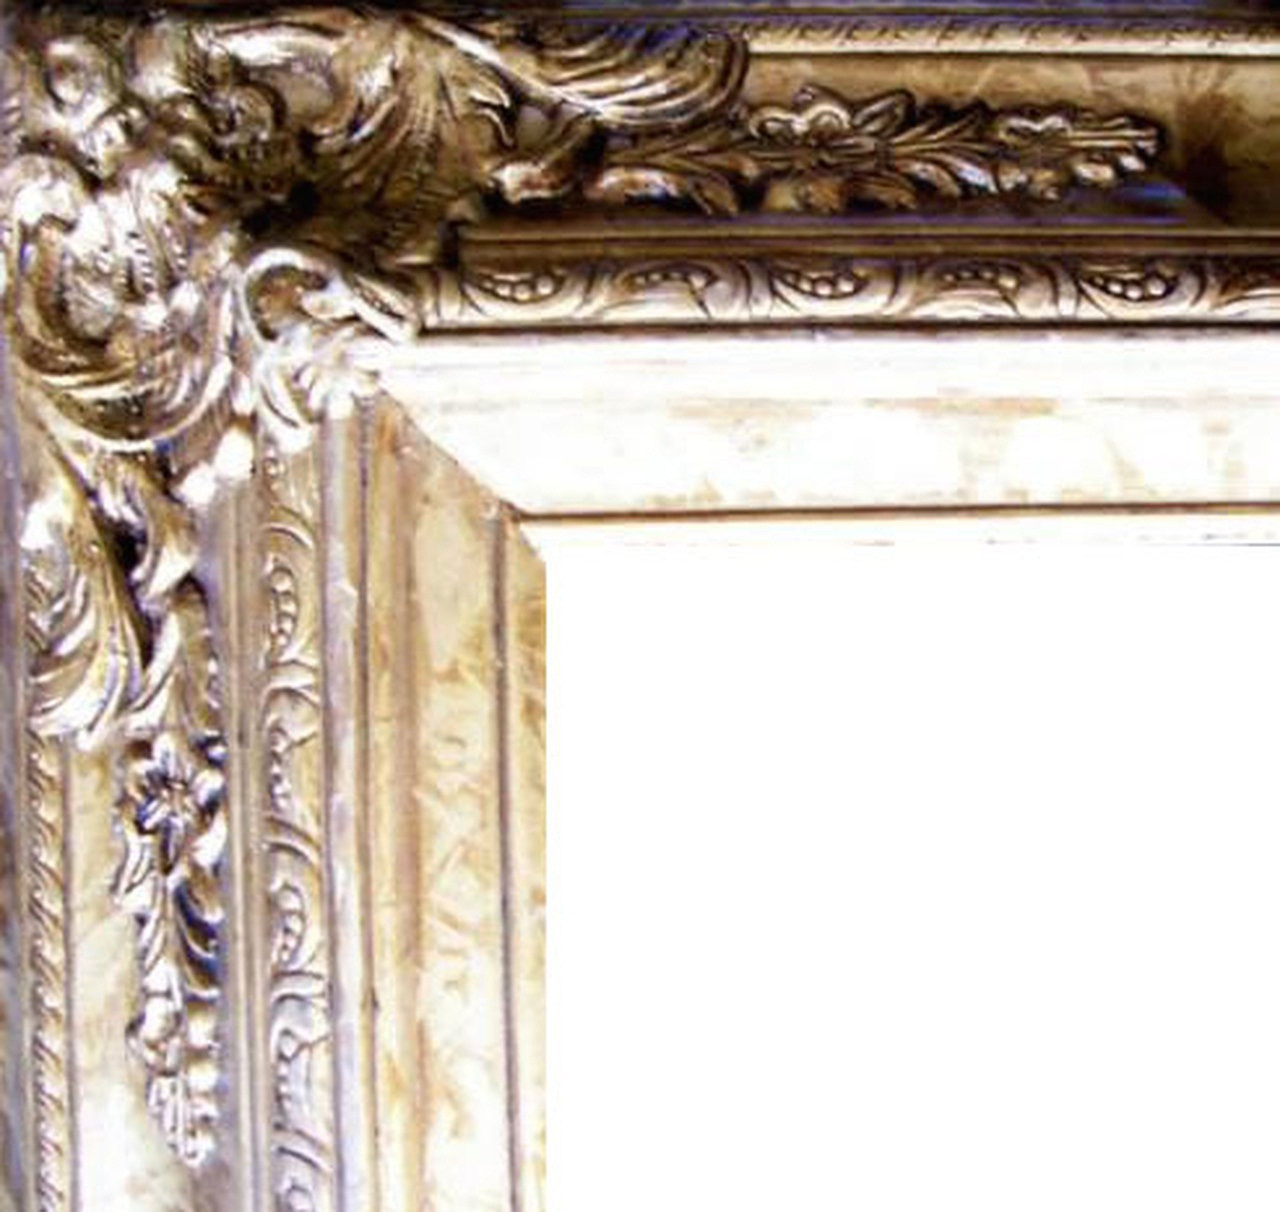 4 Ornate Wood Frames